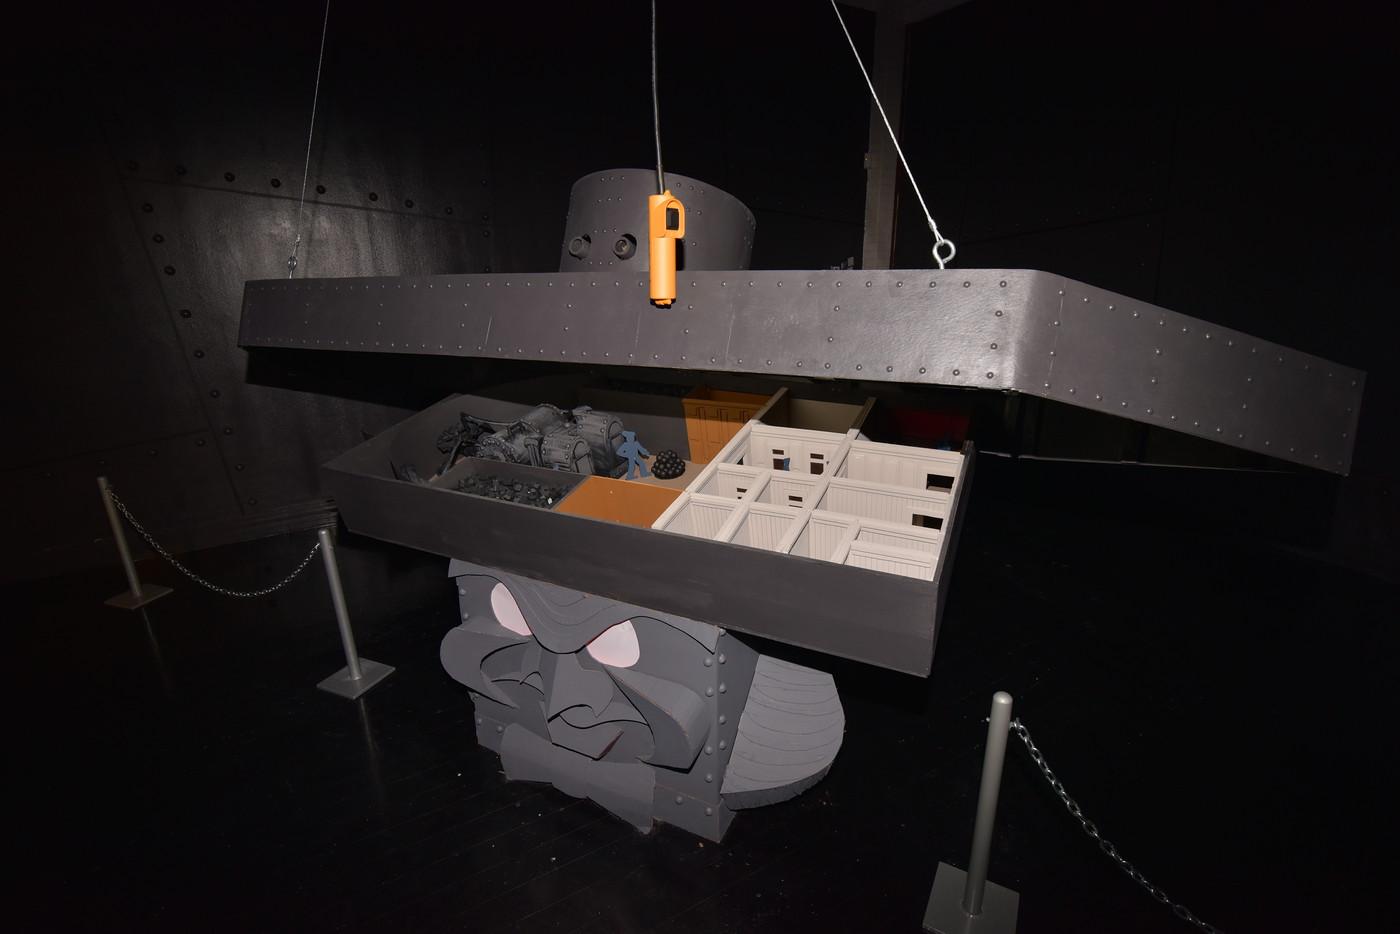 AH0 4863